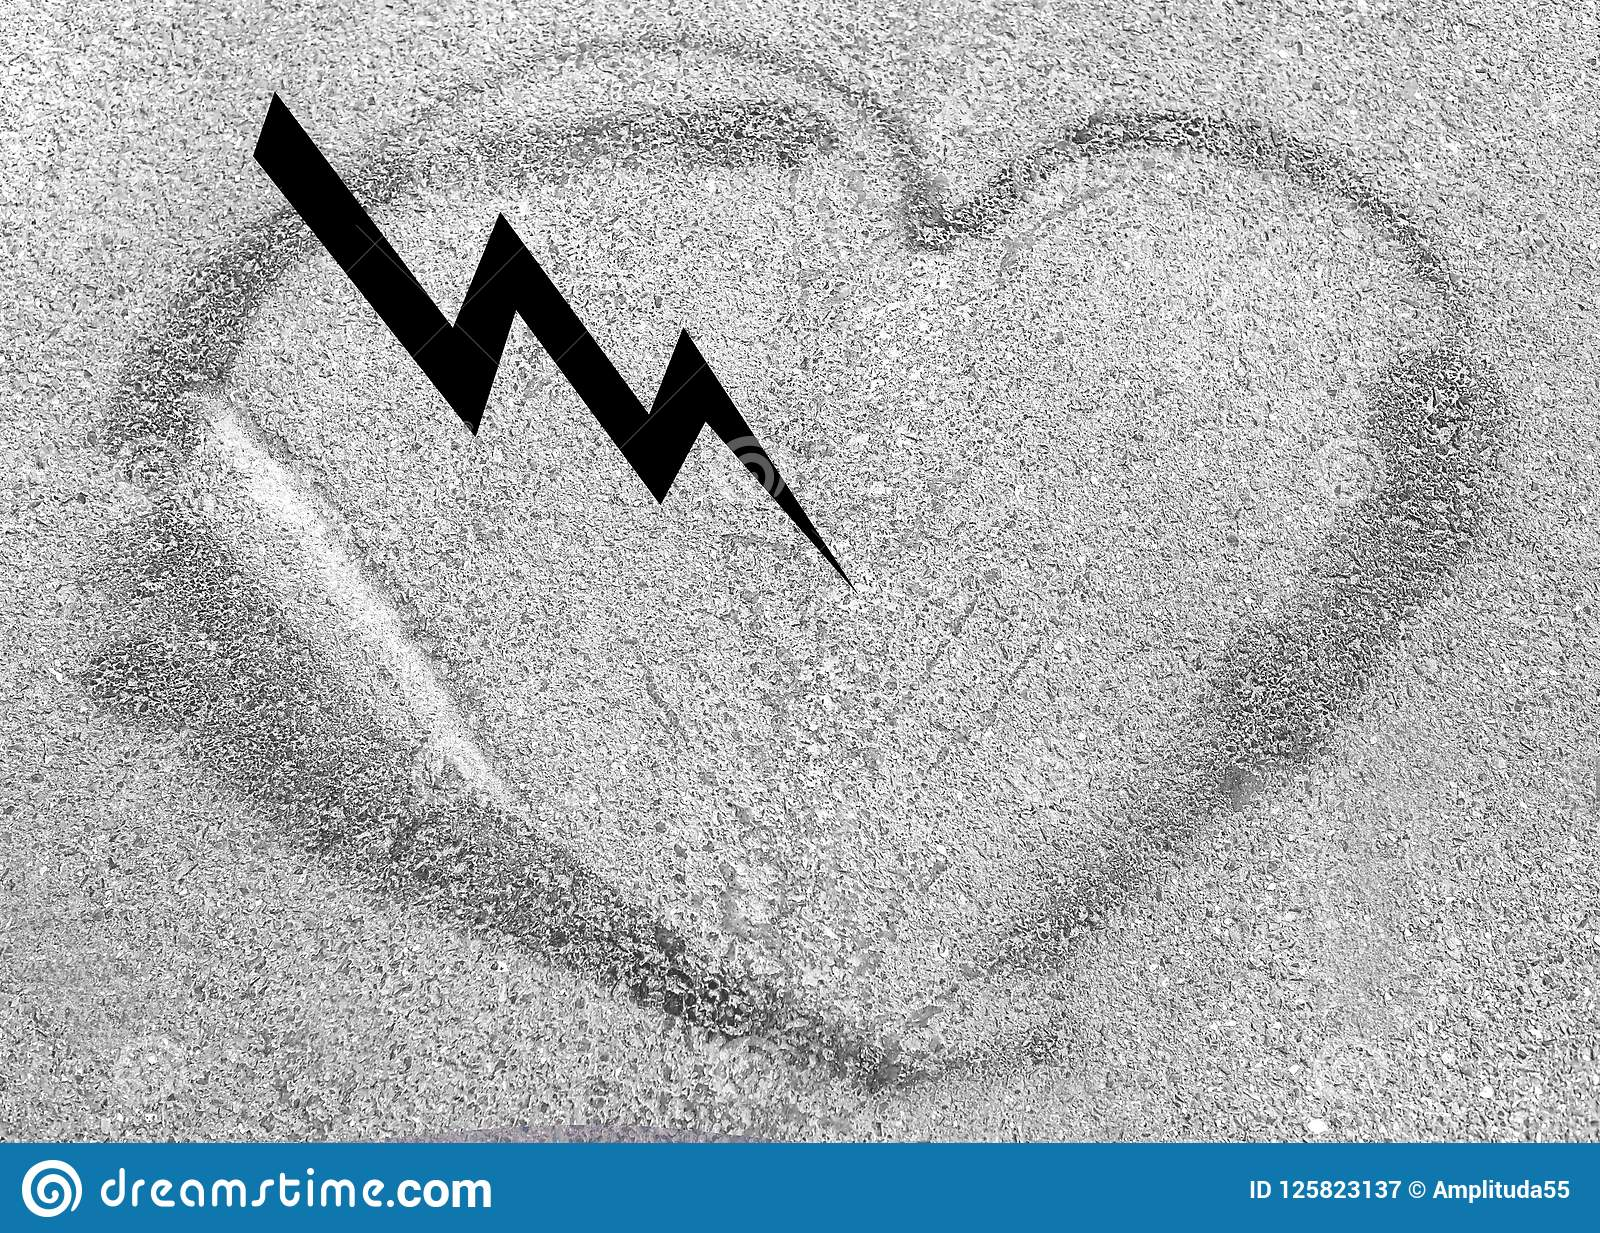 Heart shaped drawing on asphalt, love concept. lightning in the heart